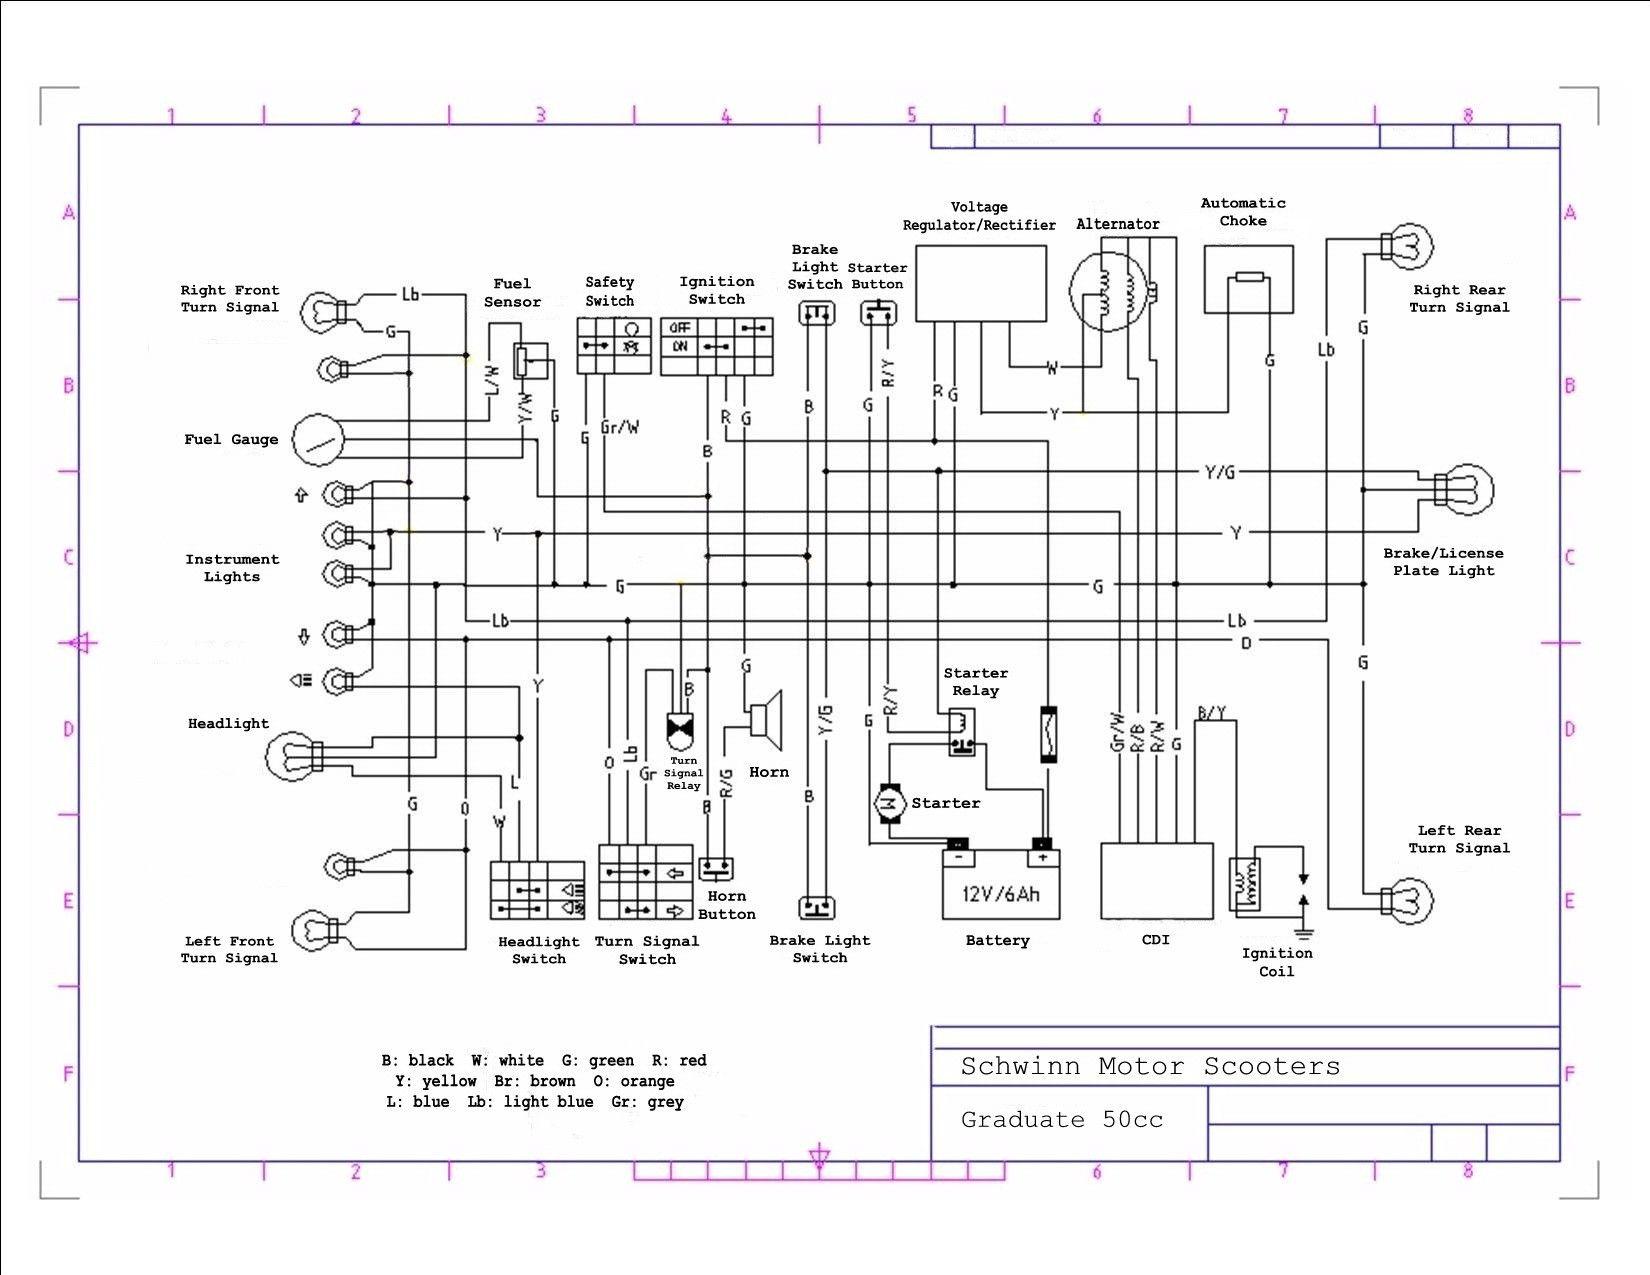 50cc Scooter Wiring Diagram Chinese Atv Cdi Wiring Diagram Chinese Electrical Diagram Electrical Wiring Diagram Diagram